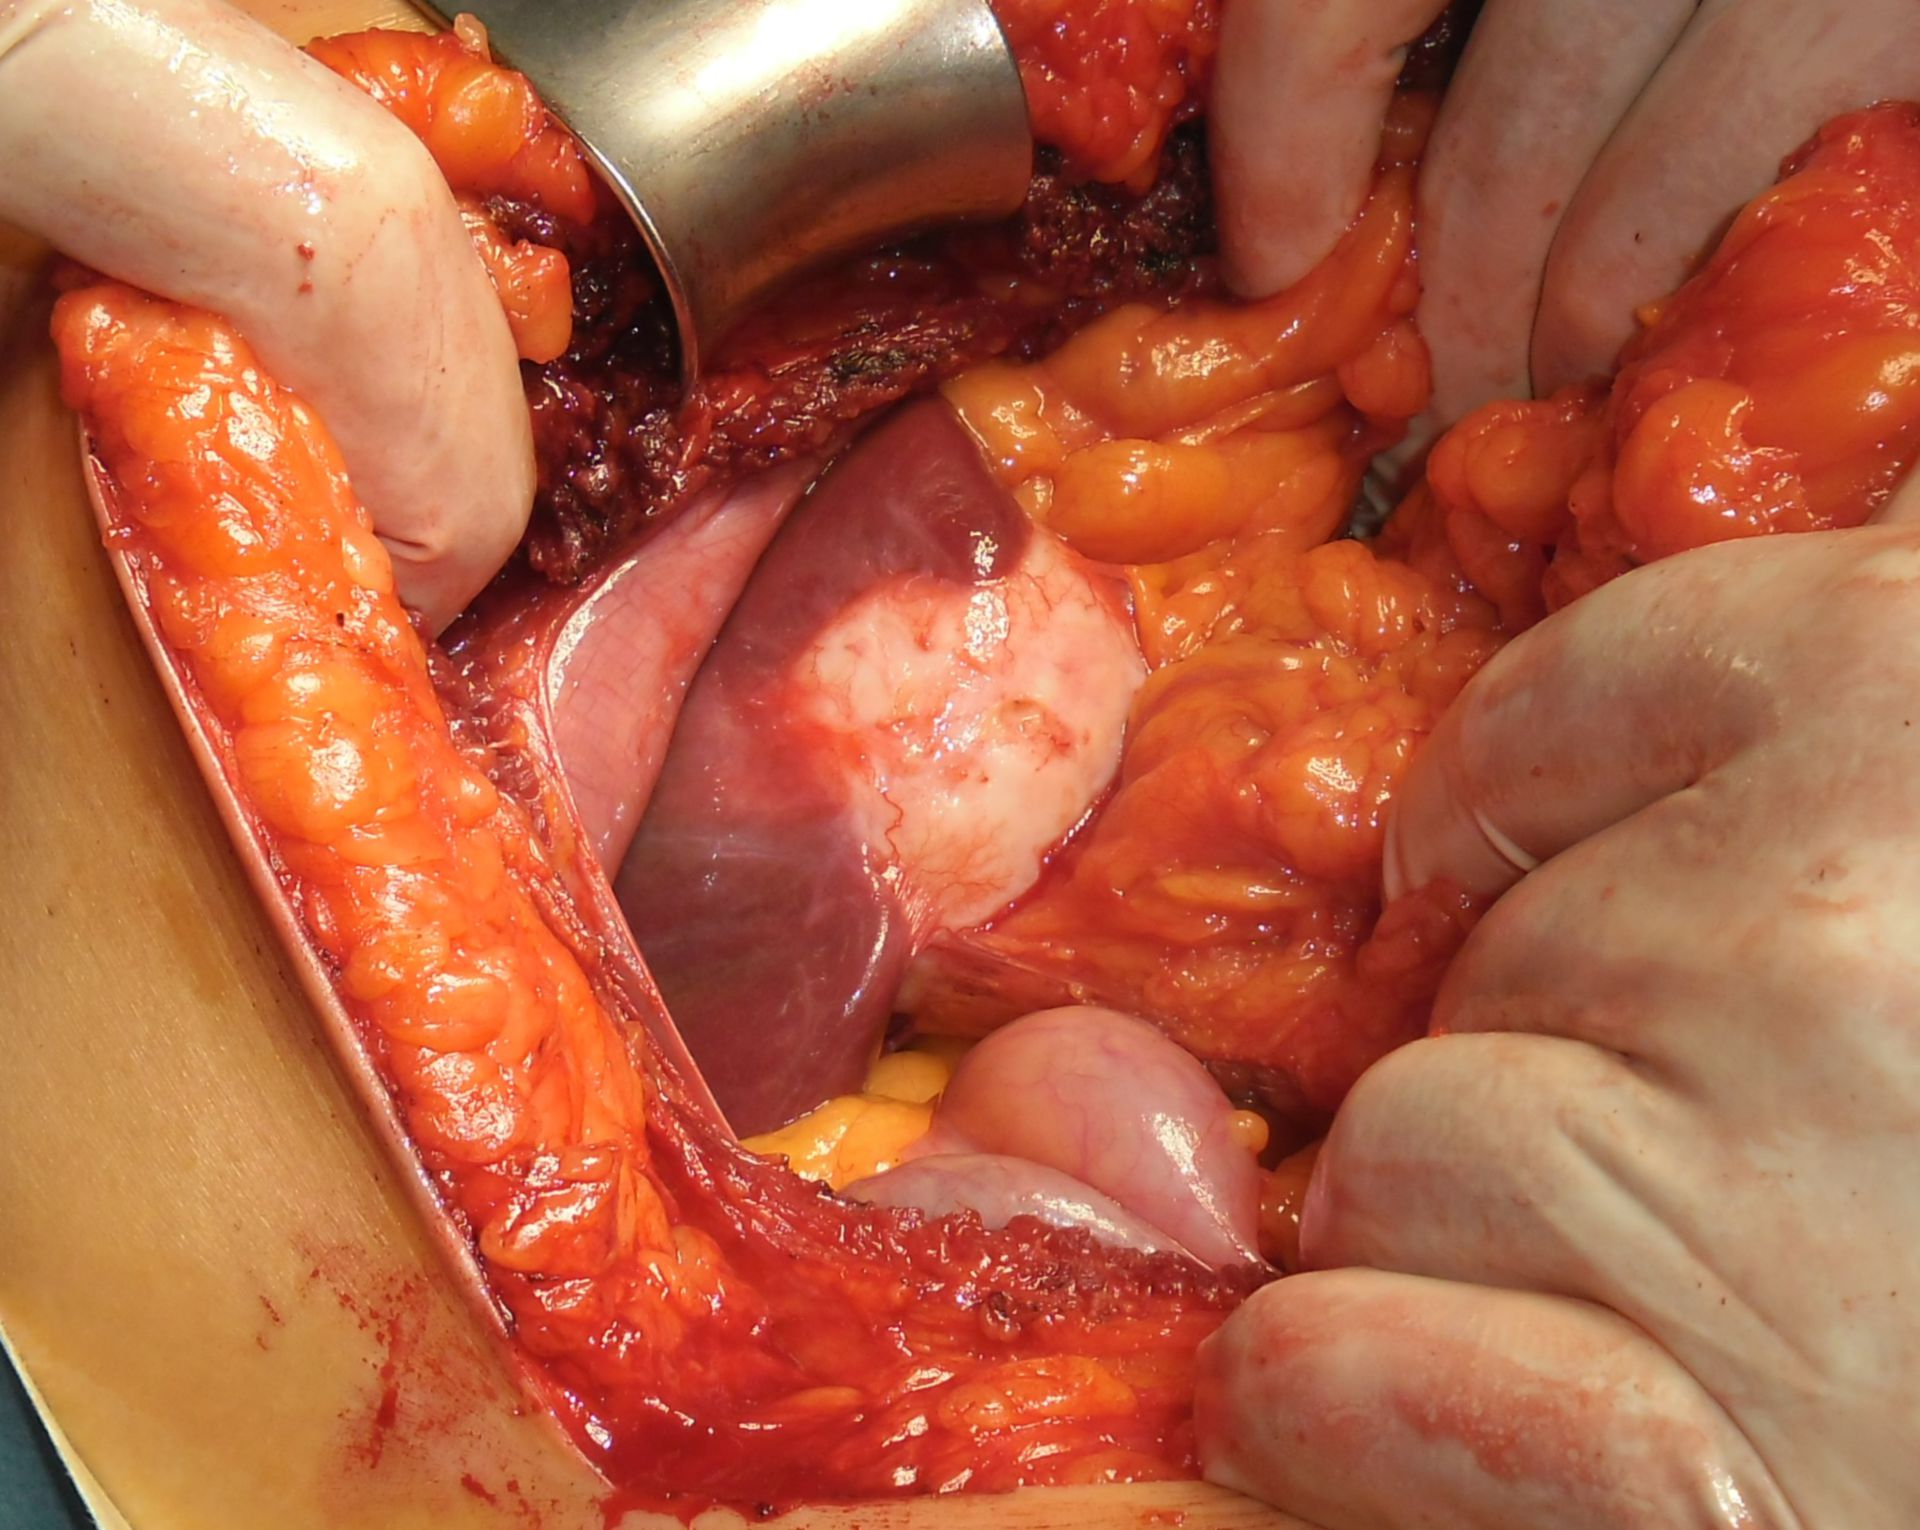 Vesícula biliar (2)